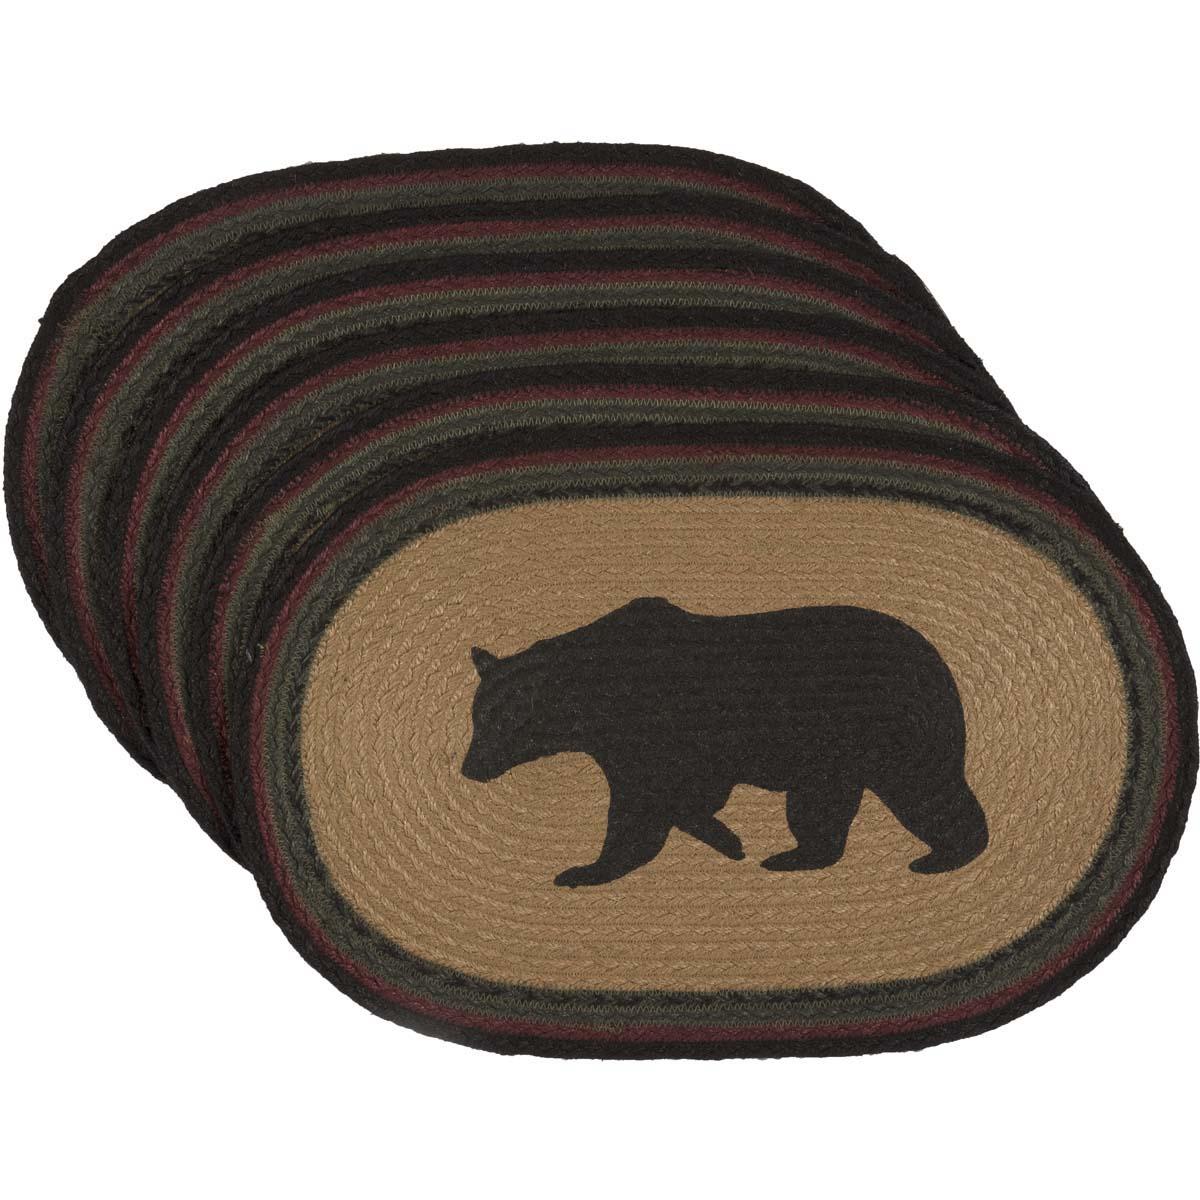 Wyatt Stenciled Bear Jute Placemat Oval Set of 6 12x18